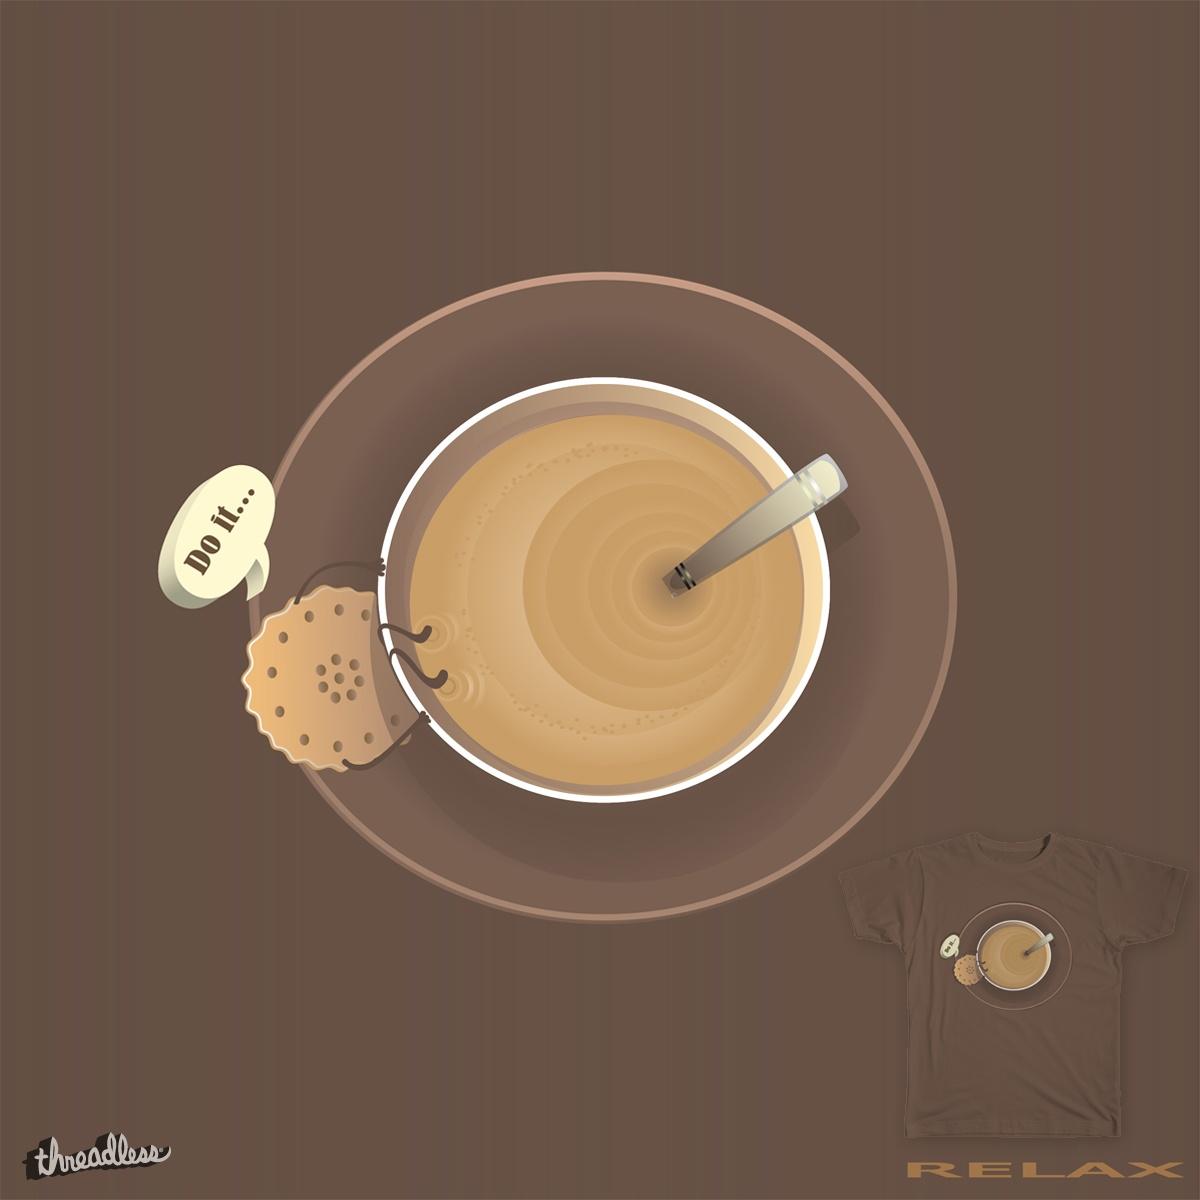 Relax by ruzik1111111 on Threadless